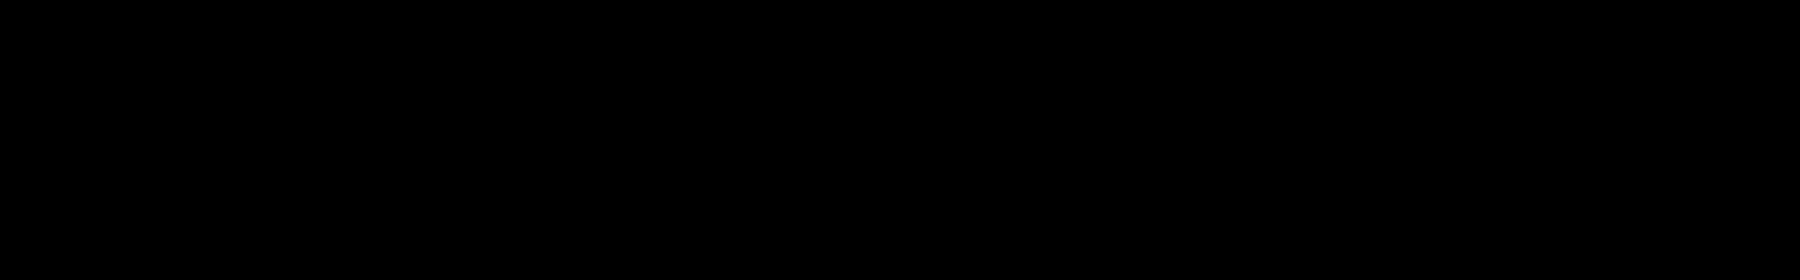 Tunecraft Nu Electro Midi Elements Vol.1 Demo - Free MIDI files audio waveform